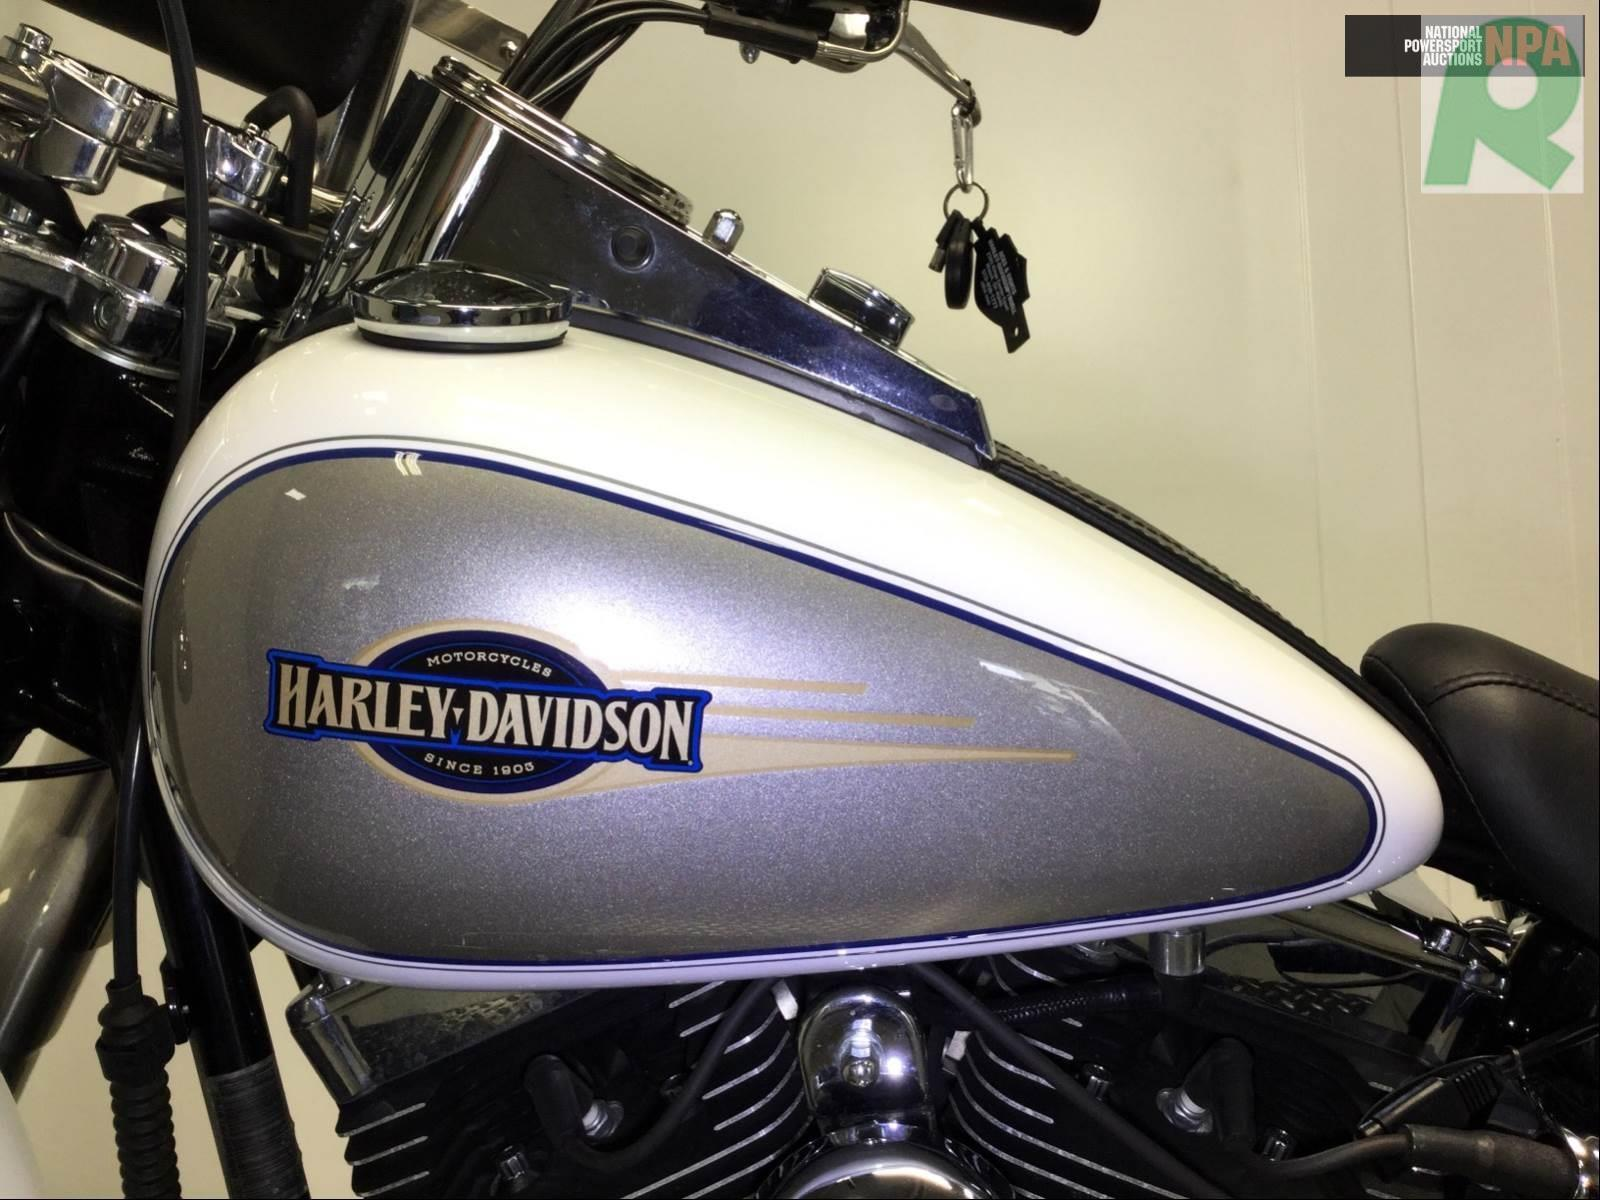 2008 HARLEY-DAVIDSON FLSTC HERITAGE SOFTAIL CLASSIC ANNIVERSARY